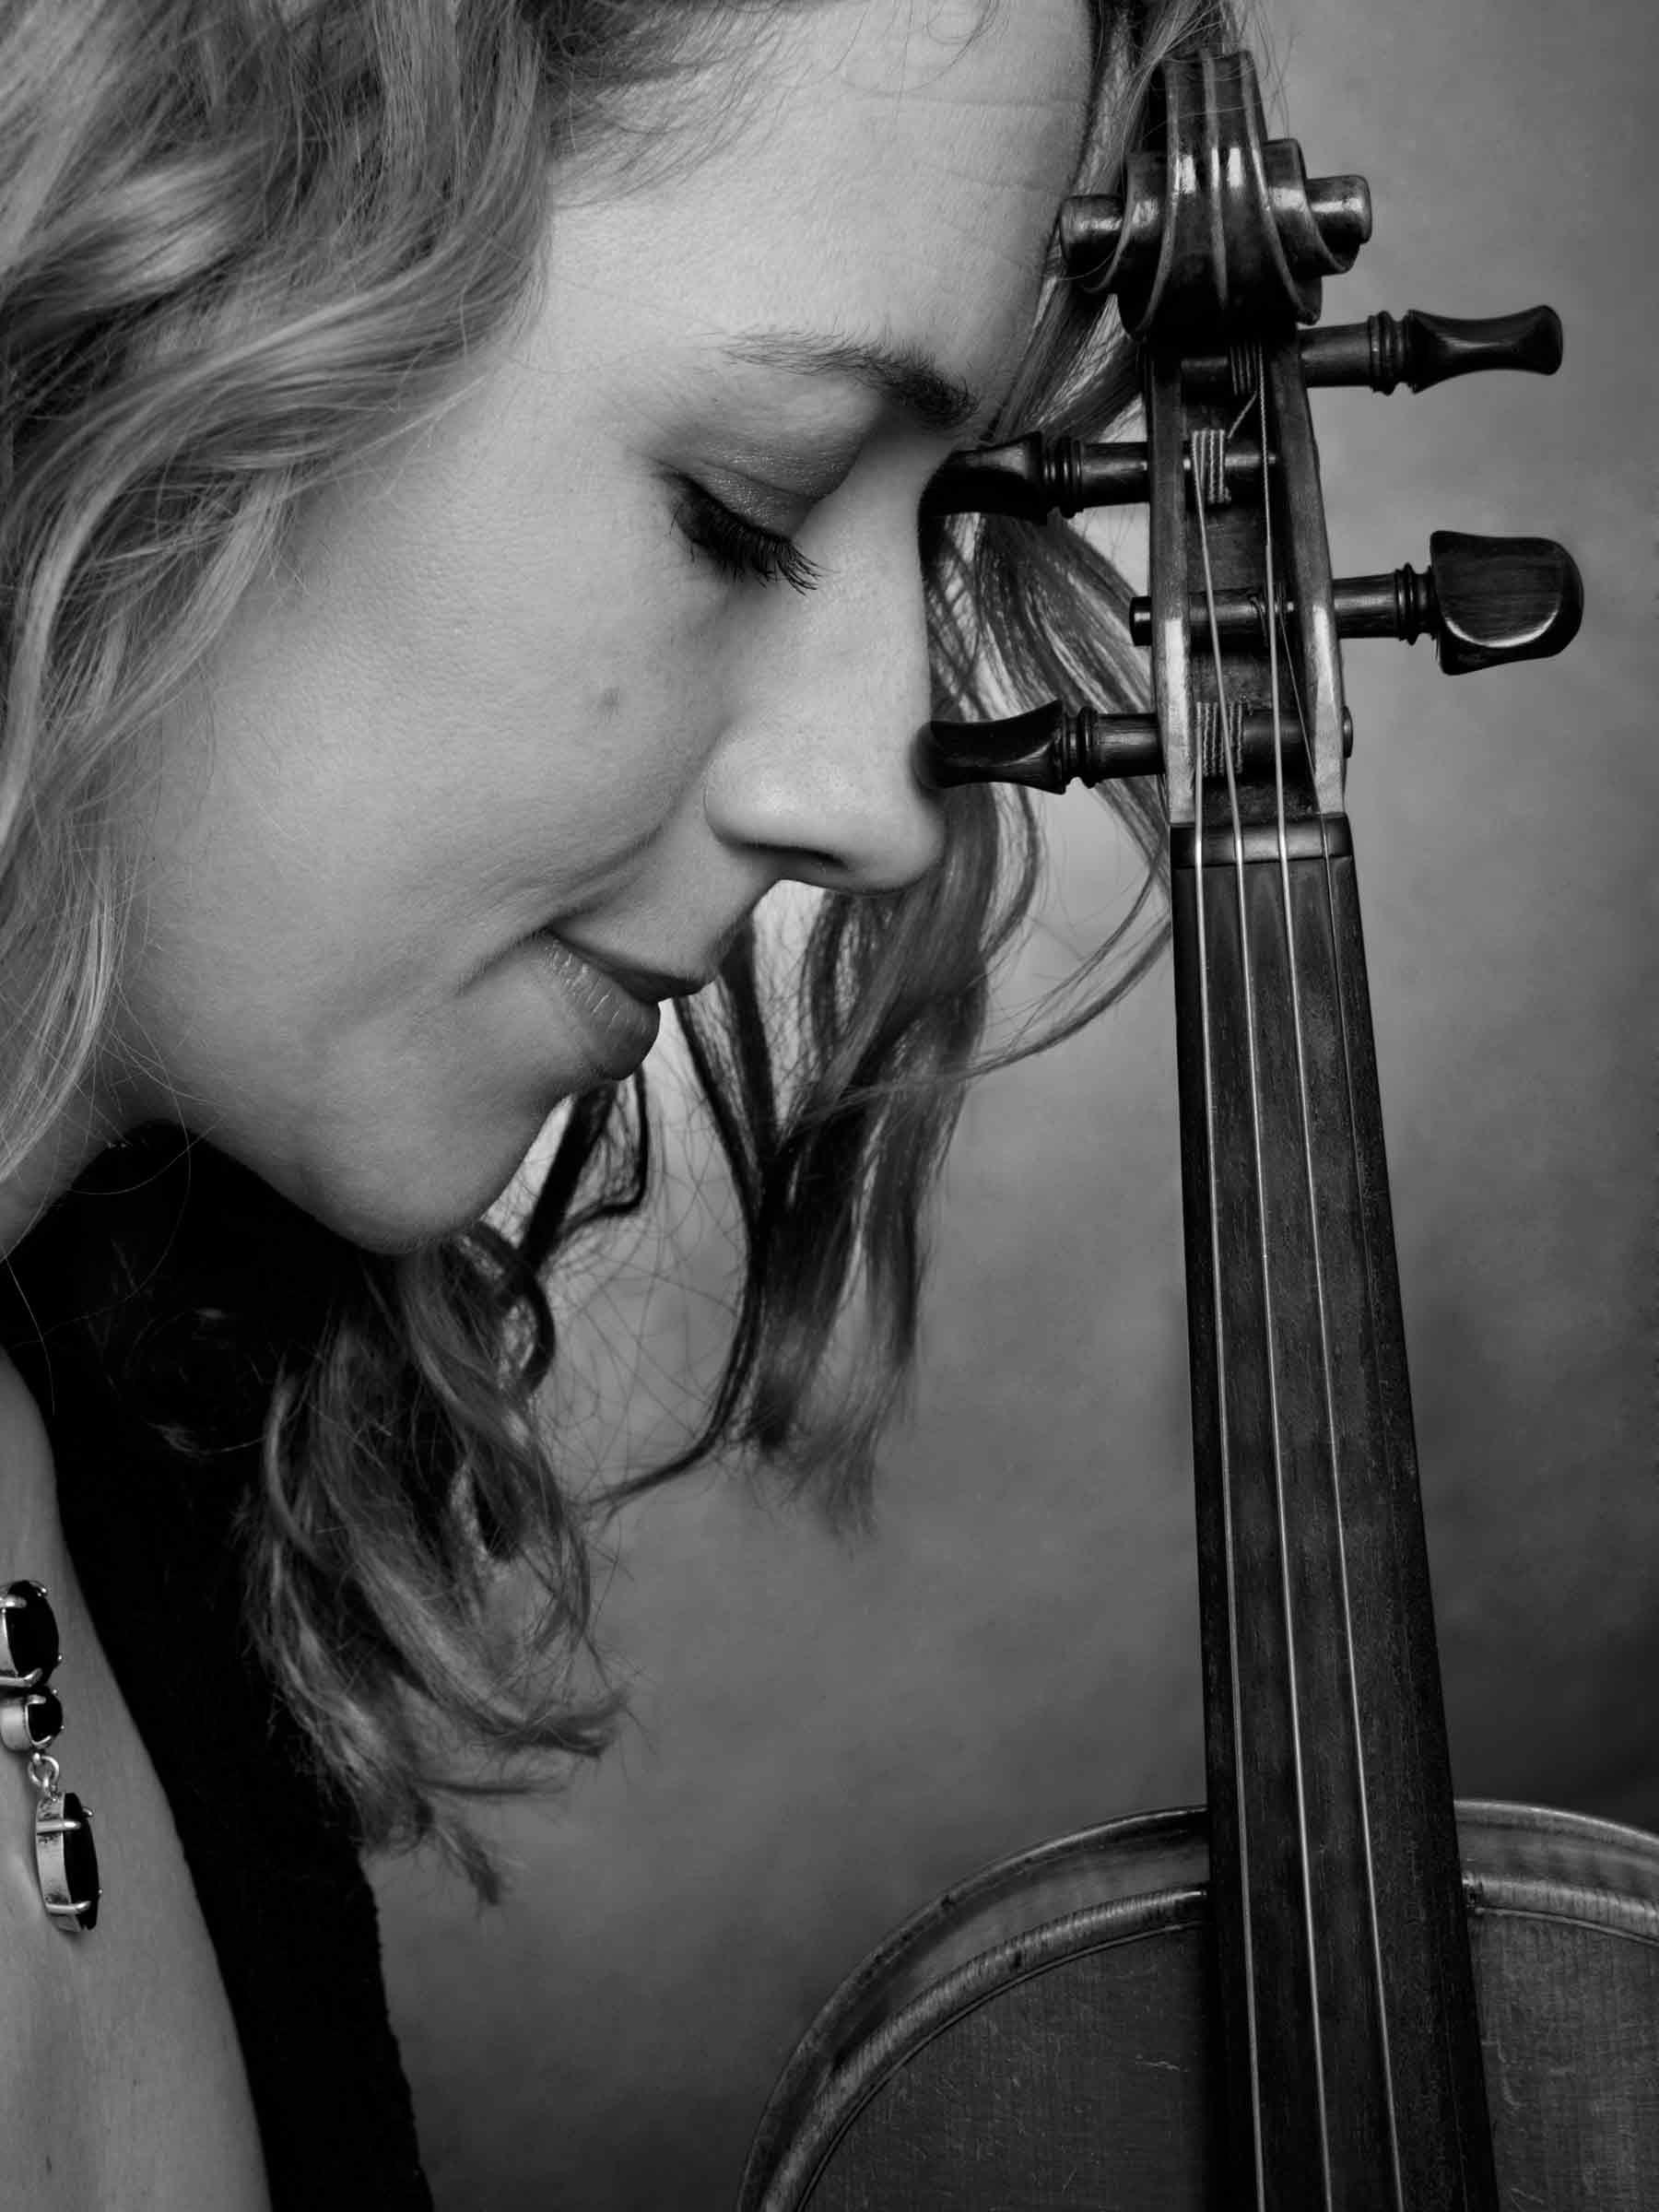 8-Portrait-Woman-Musician-Violin-Close-up-Headshot-Black-And-White-Philip-Murray-Photography-Dublin